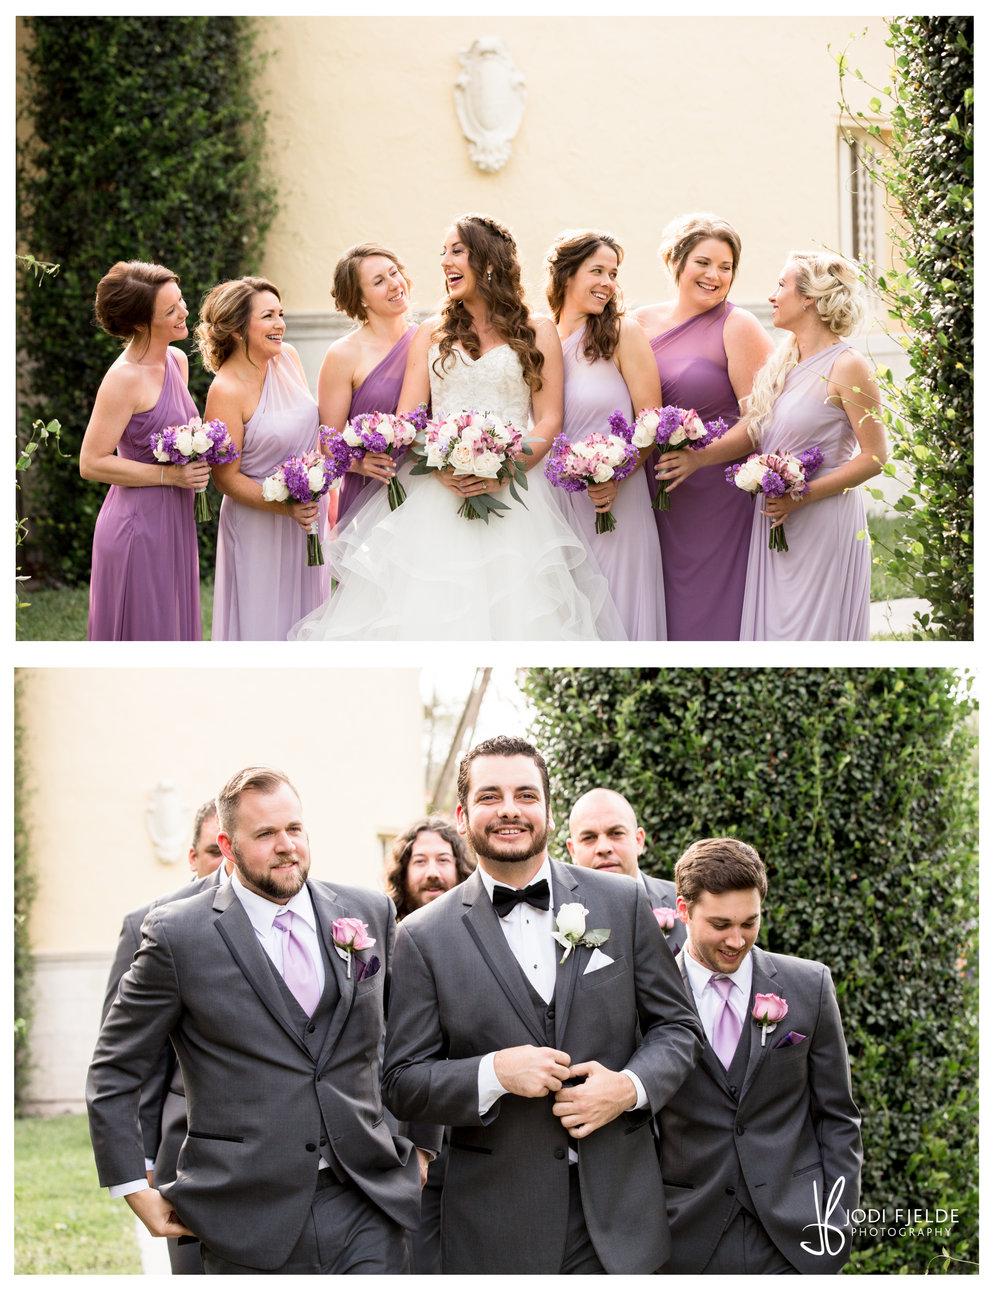 Boynton_Beach_Florida_ Benvenuto_Wedding_Heather__Doug_Married_10.jpg